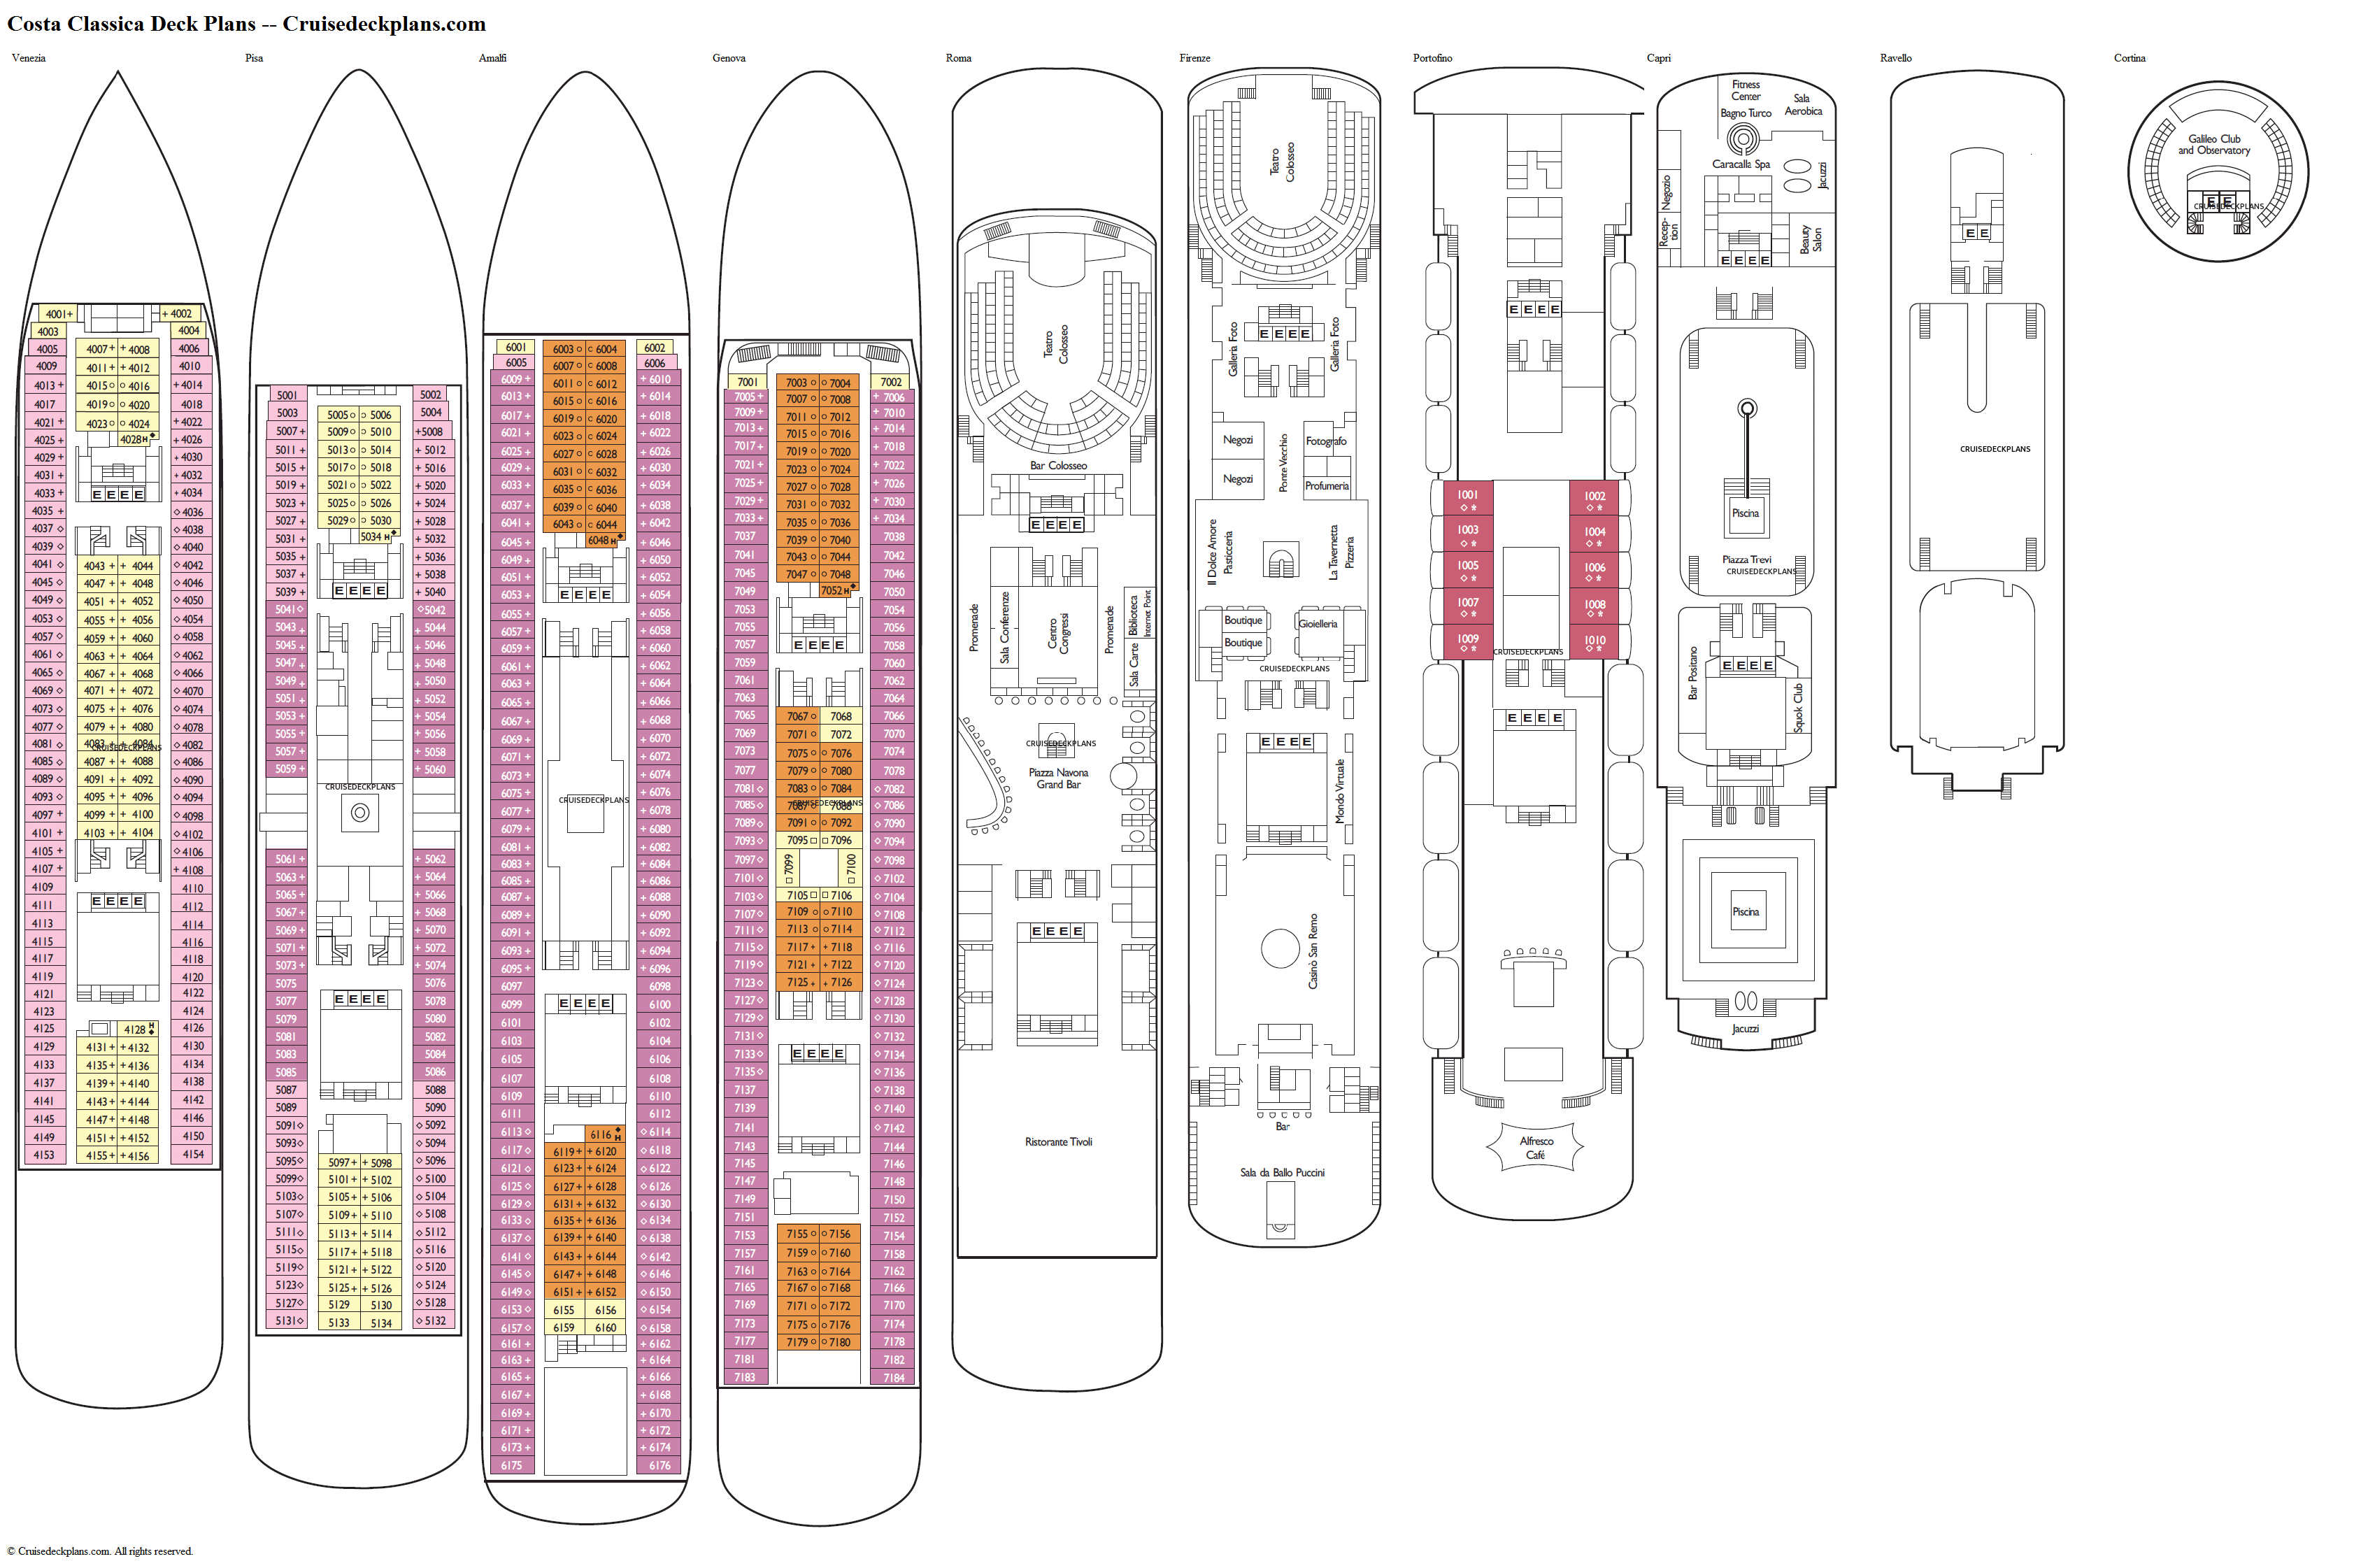 Costa Classica Deck Plans Diagrams Pictures Video